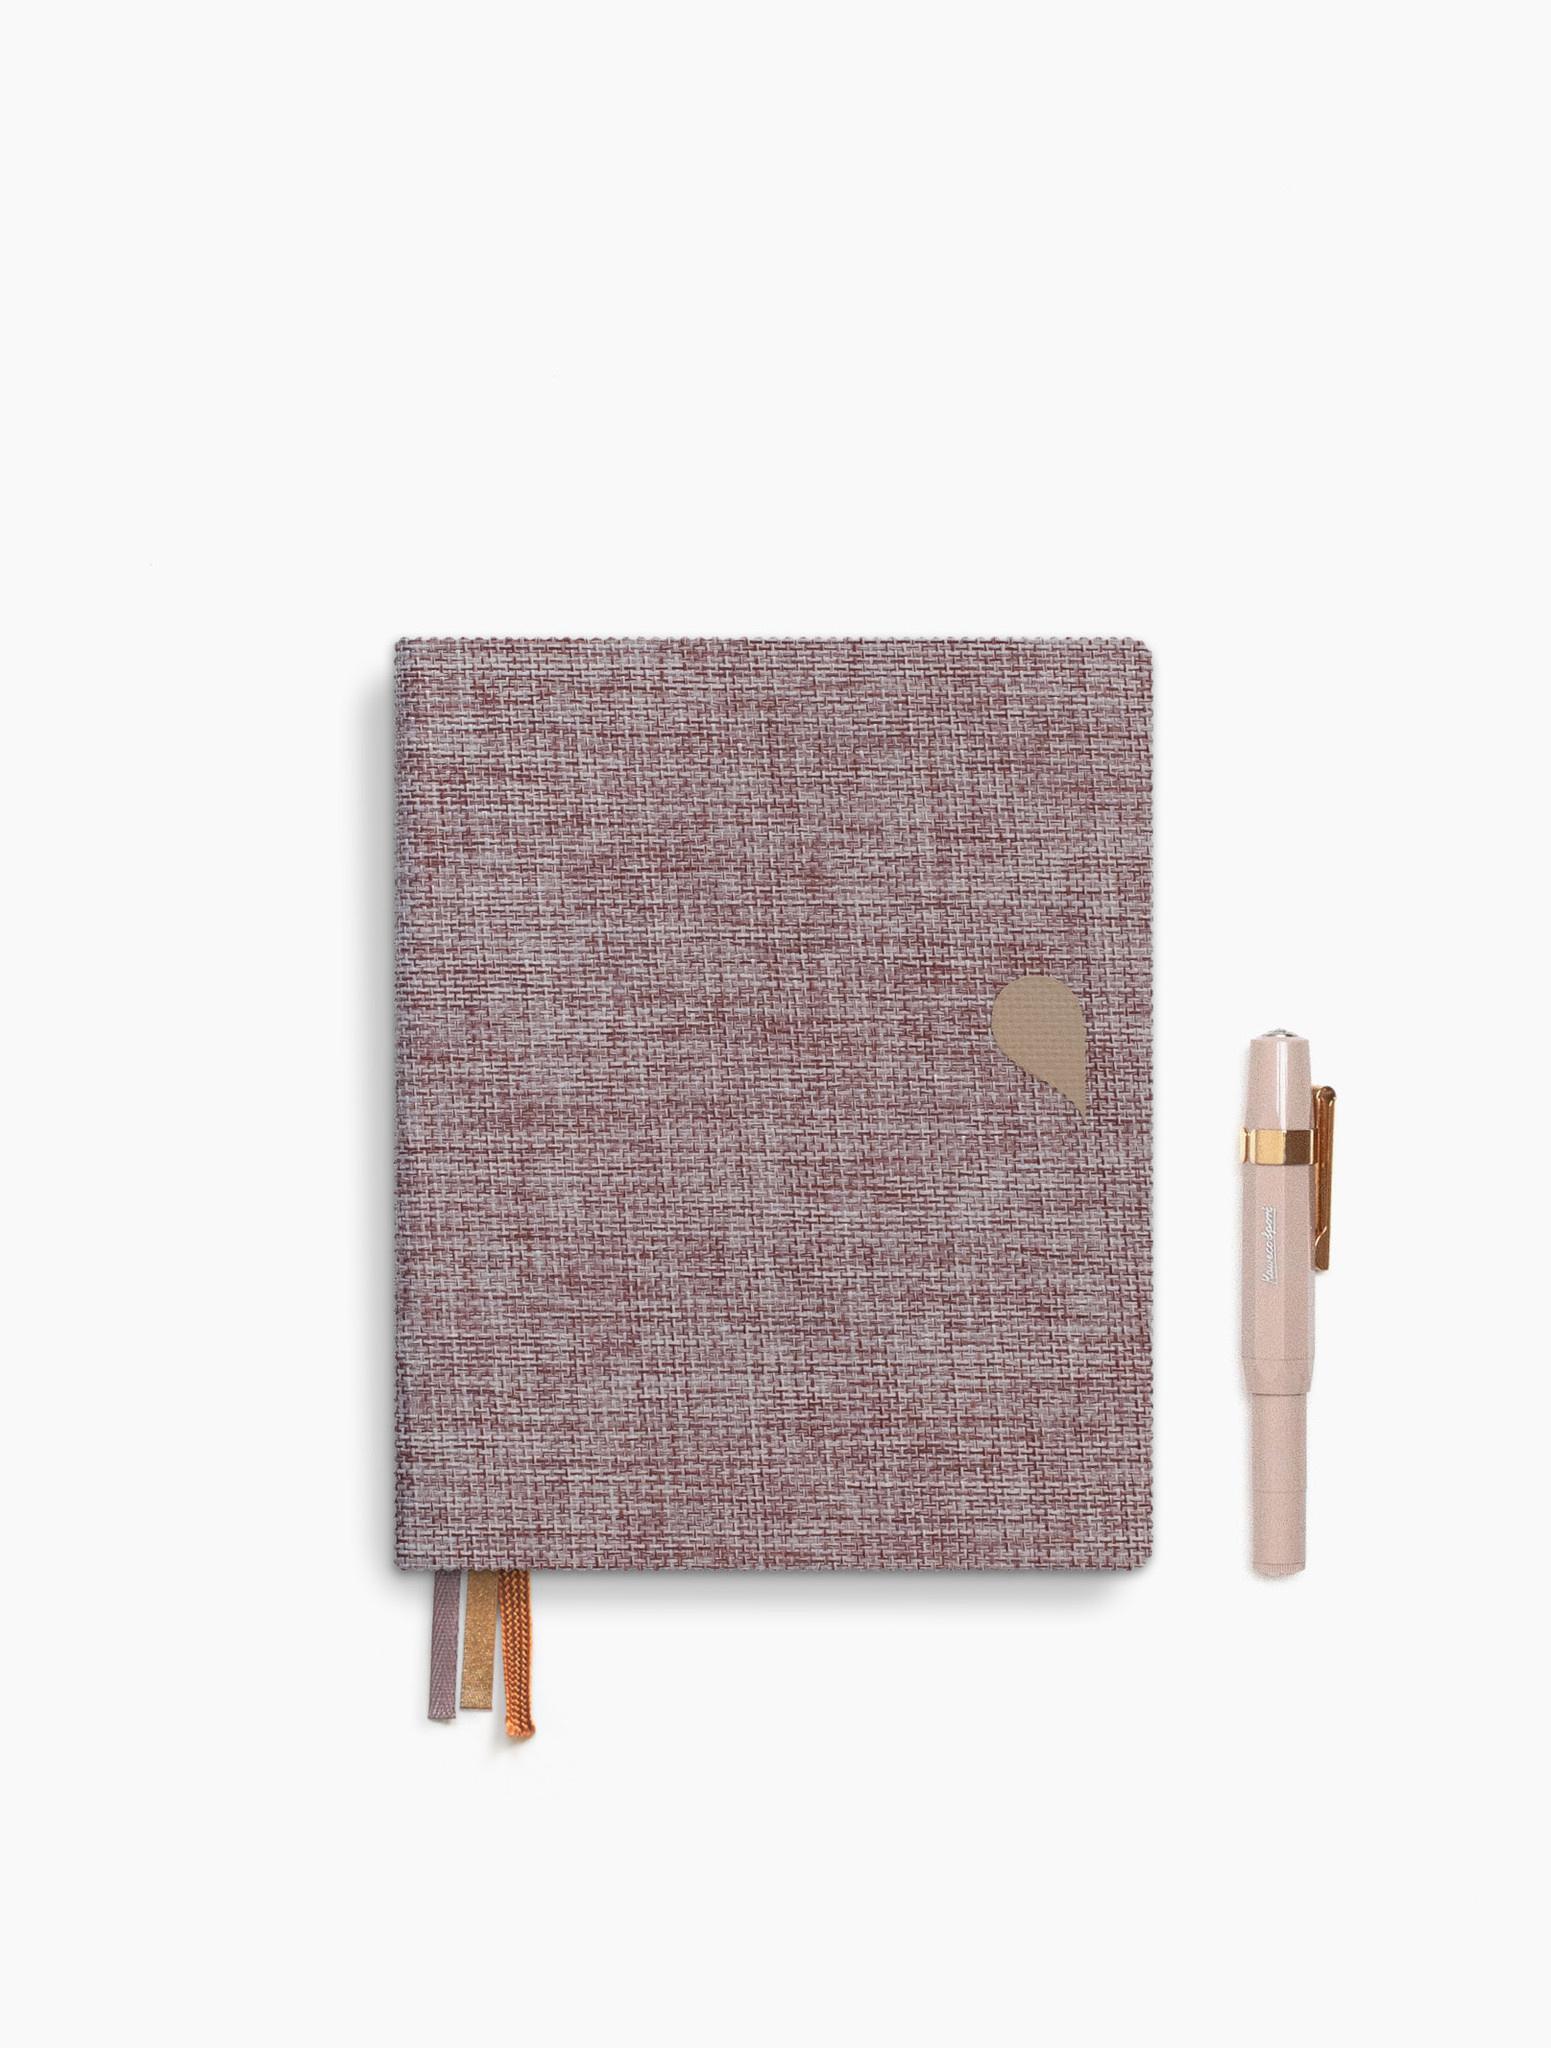 Notebook A6 - Rose dust (5pcs.)-1